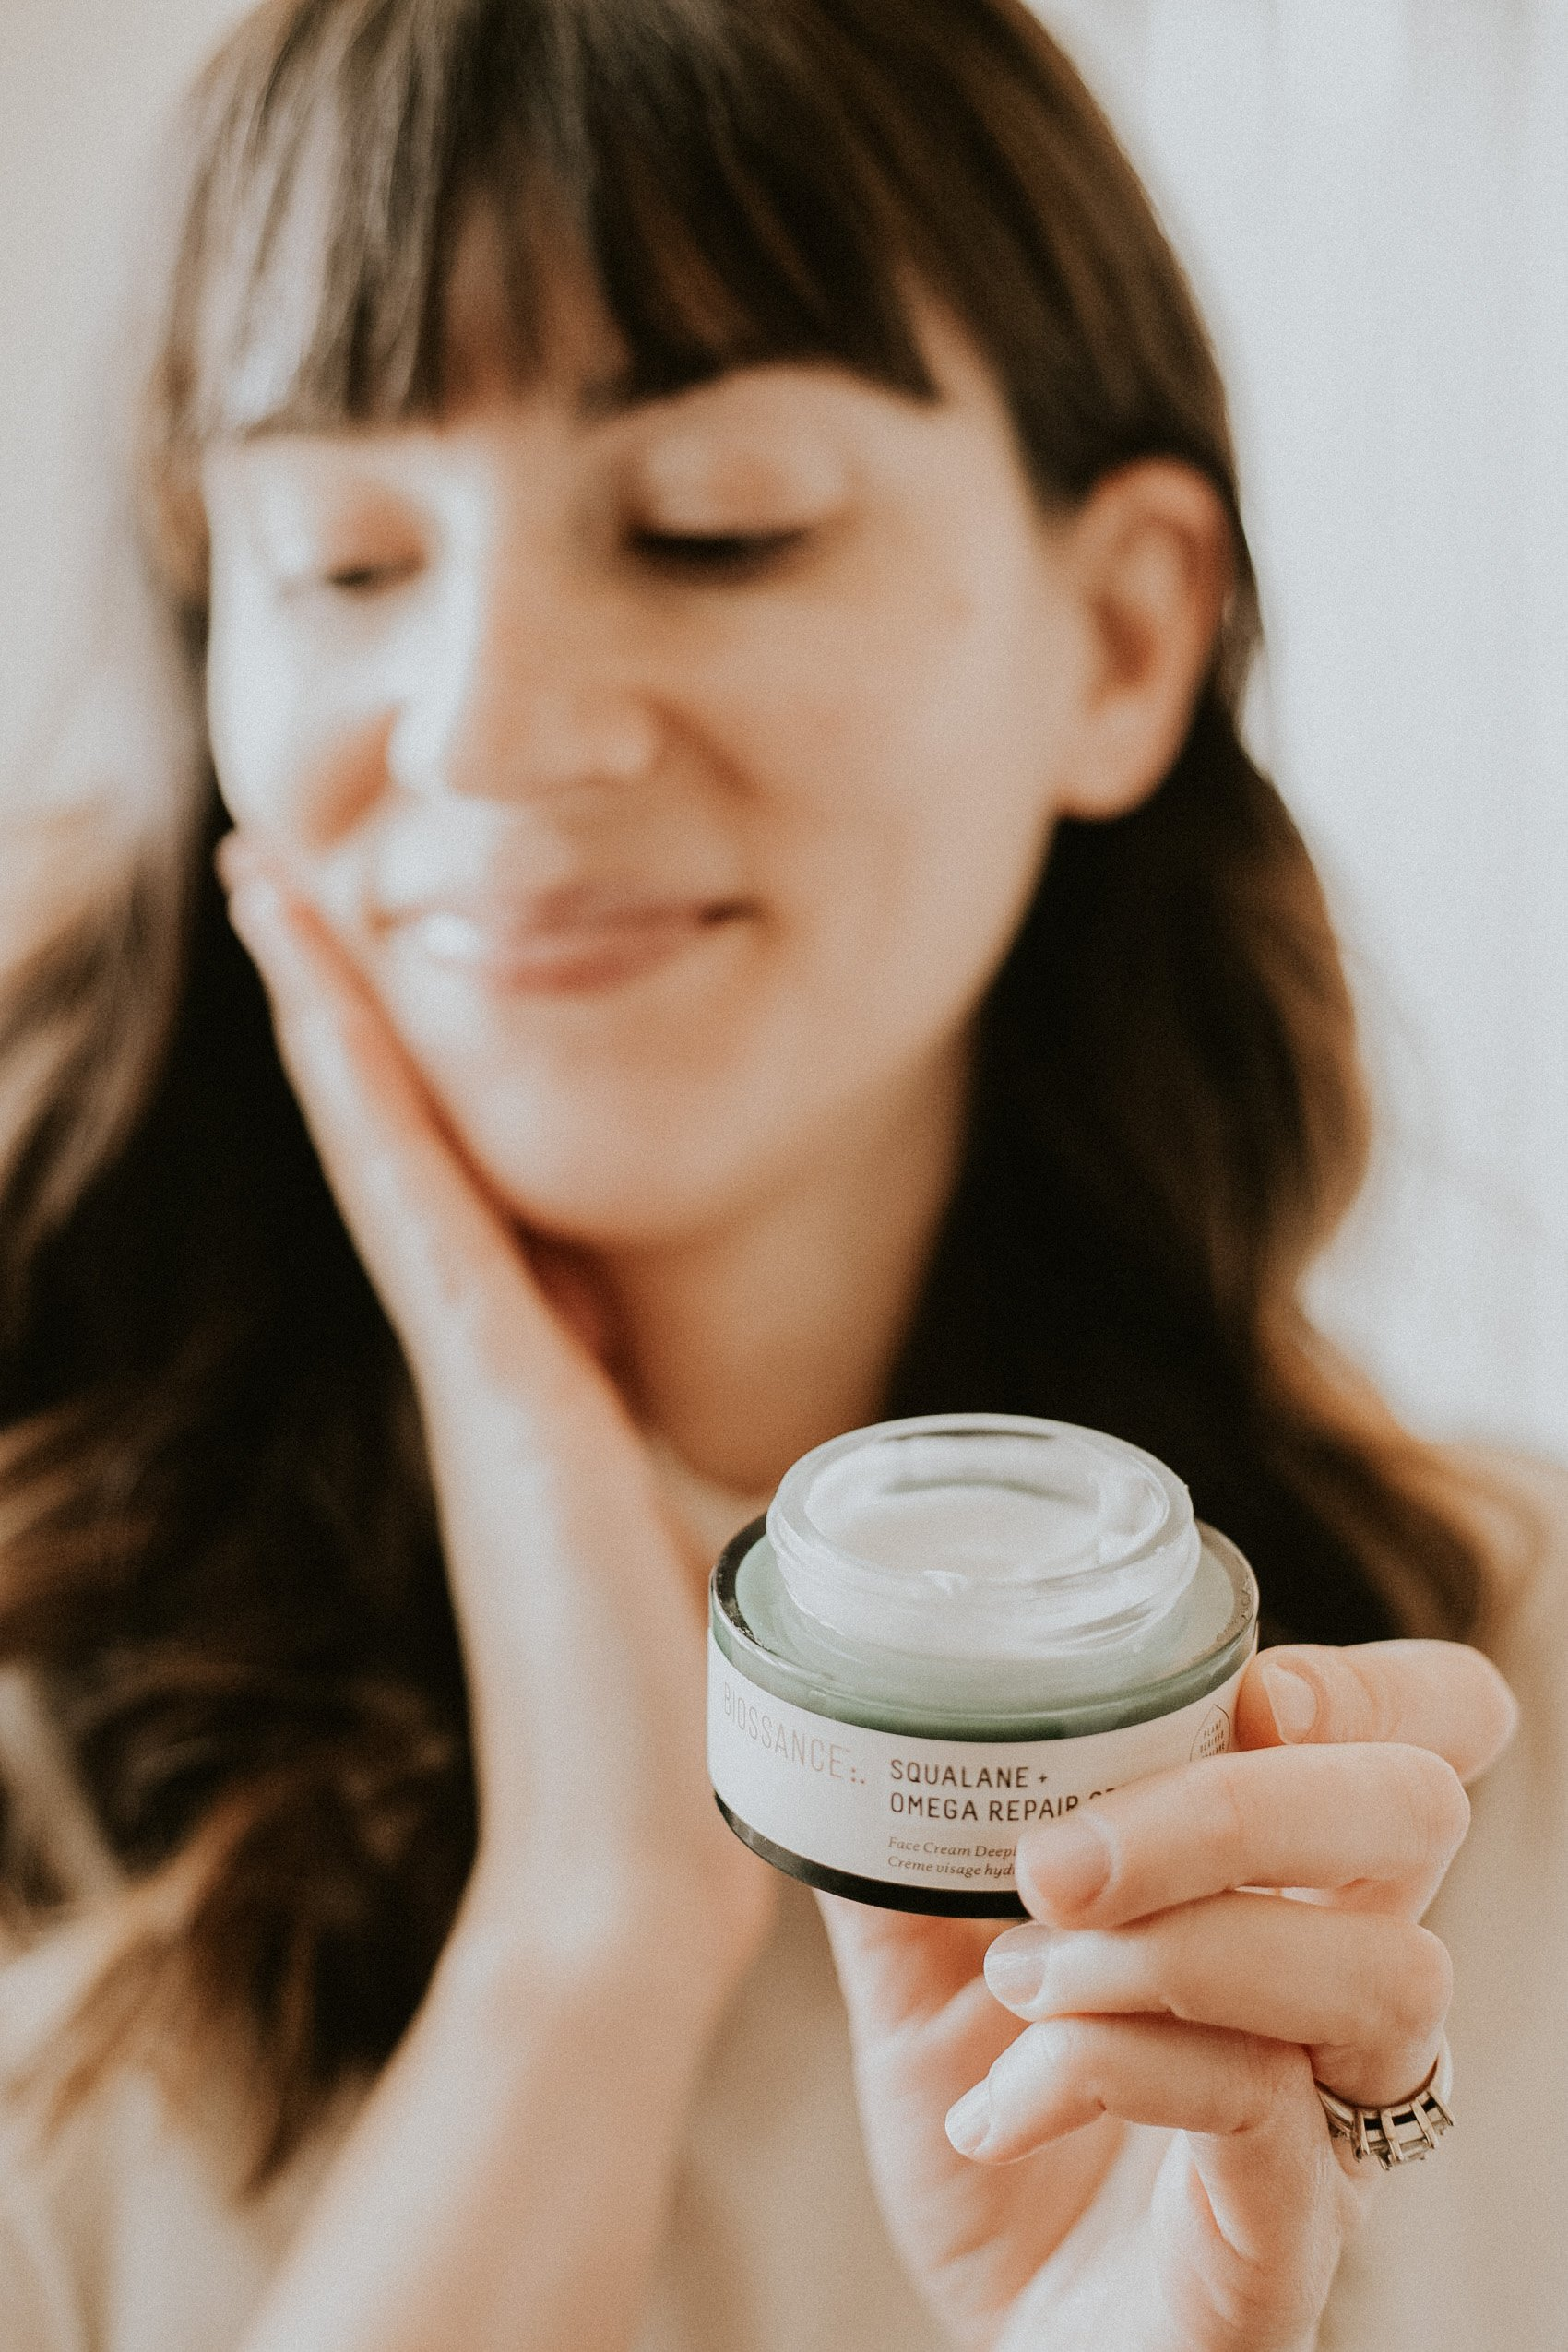 Biossance Omega Repair Cream for Winter Skin